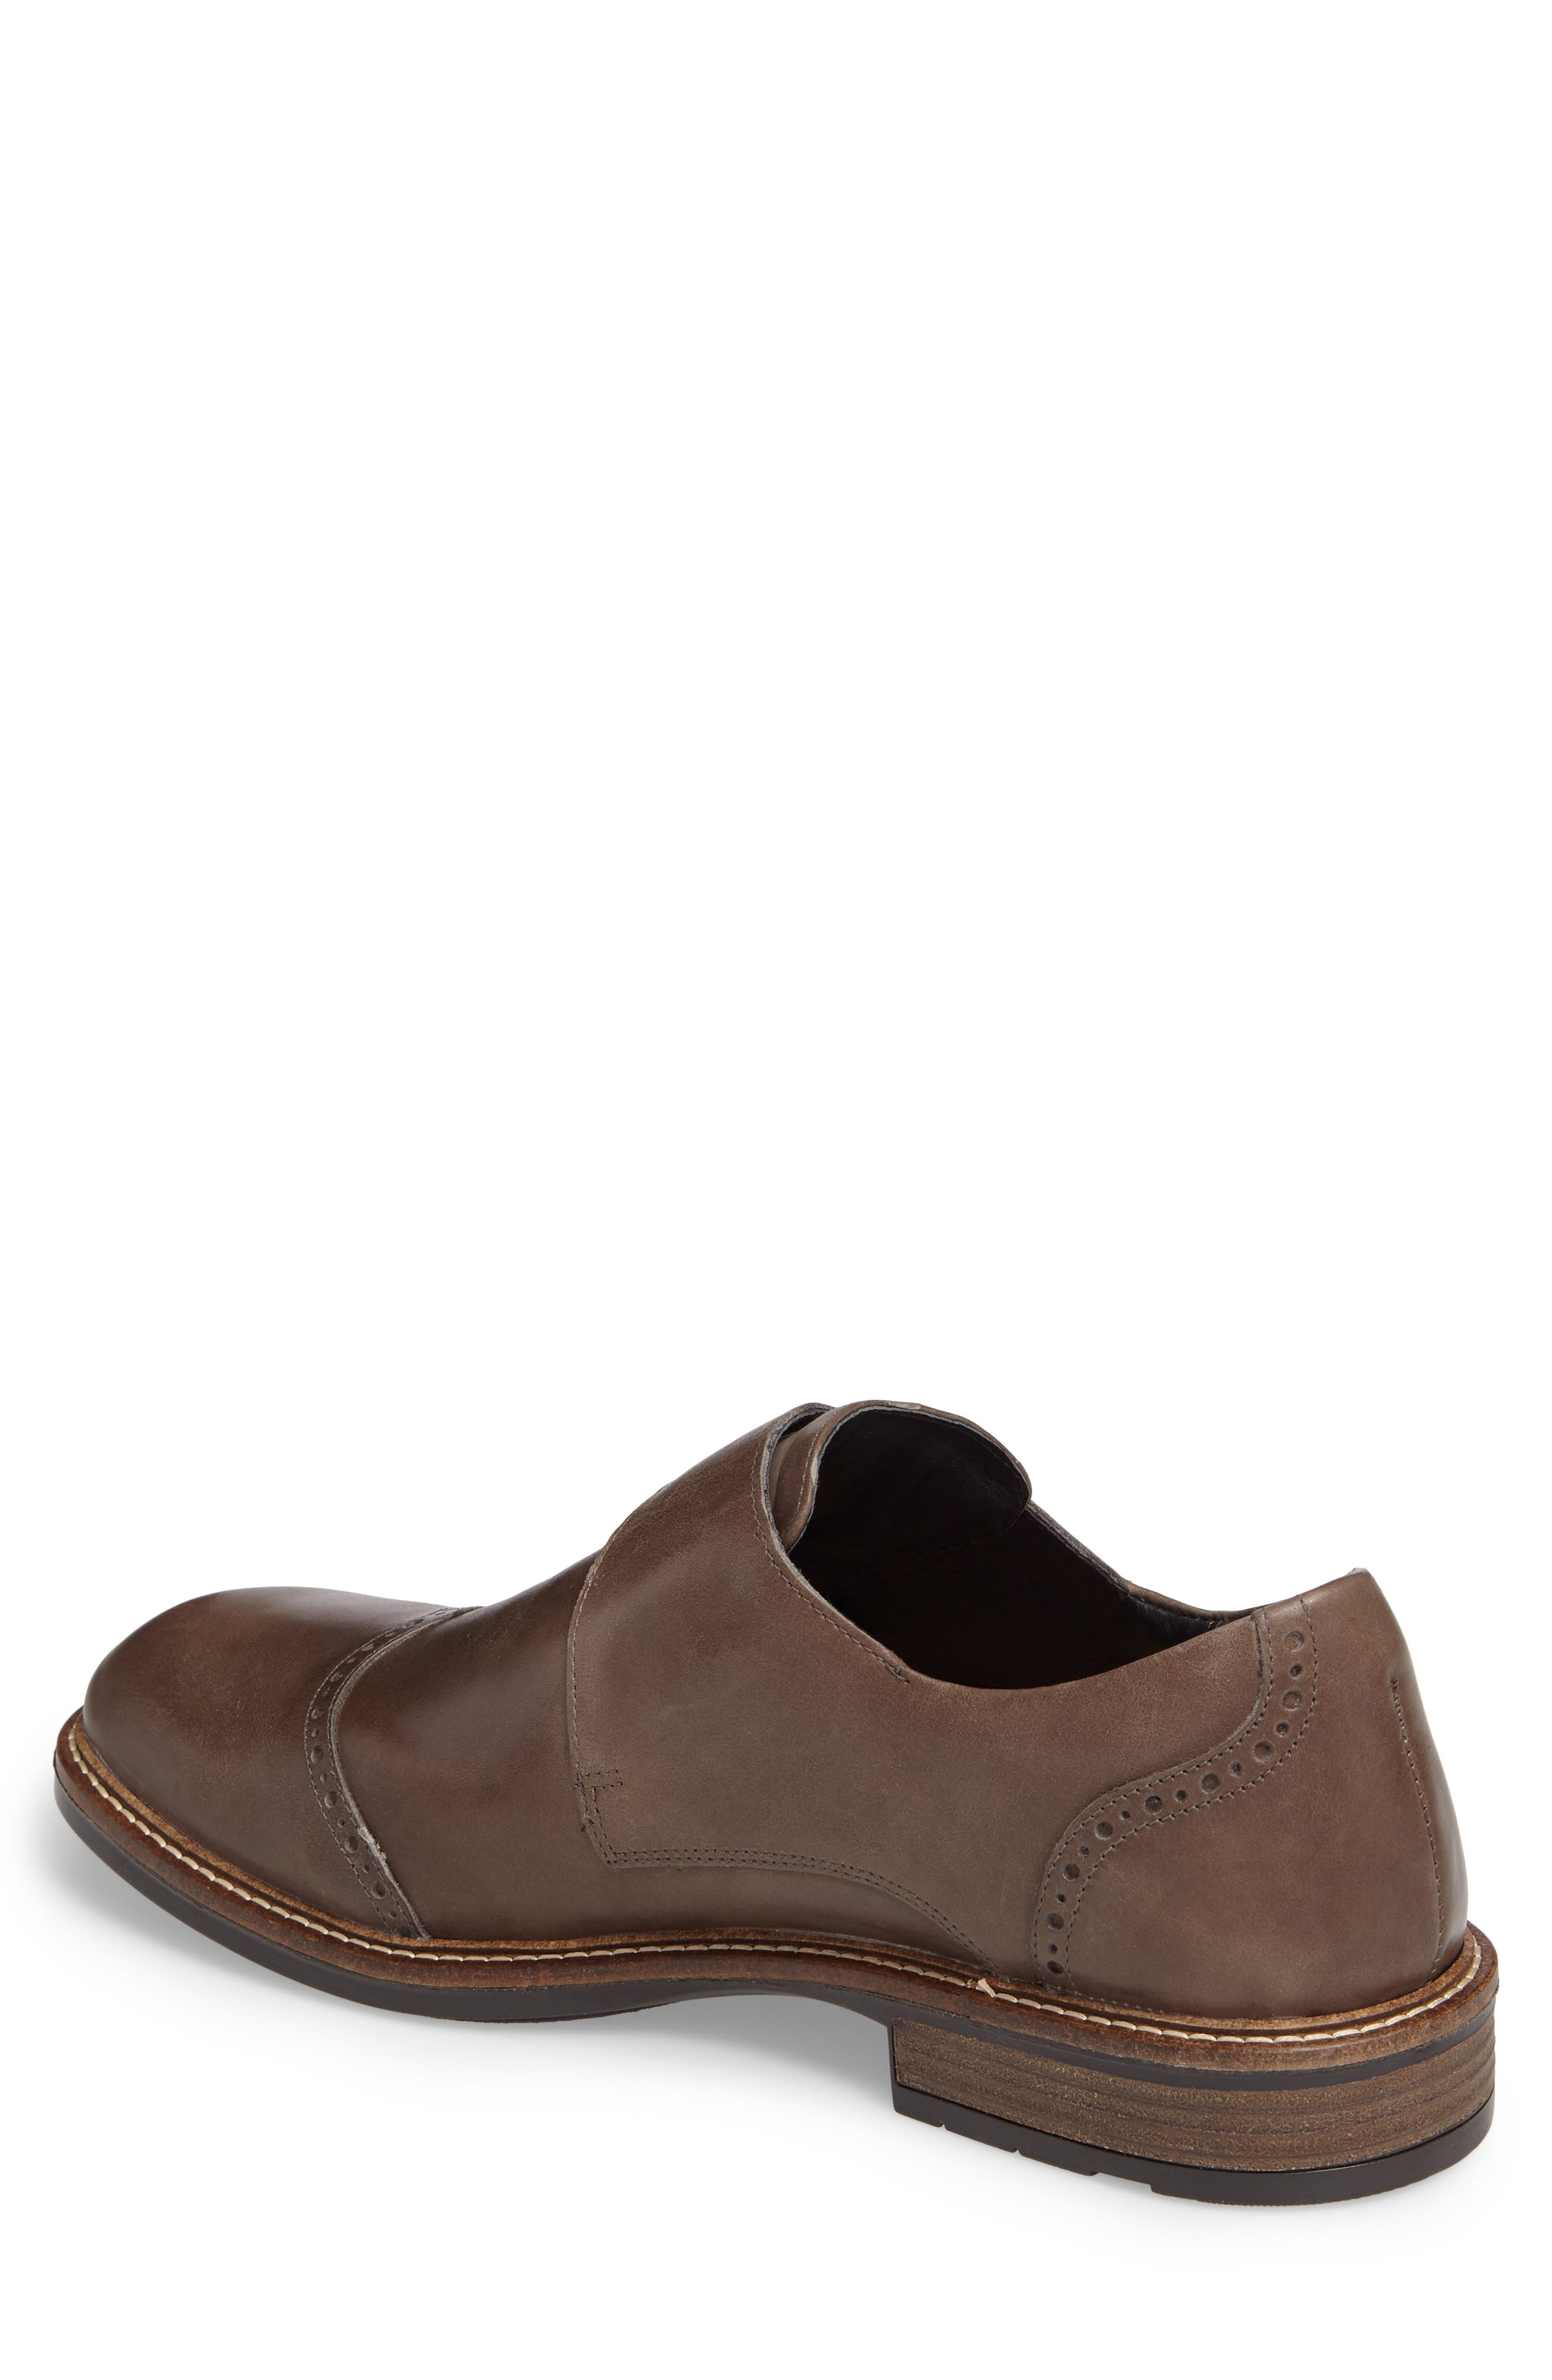 Evidence Monk Strap Shoe,                             Alternate thumbnail 2, color,                             001